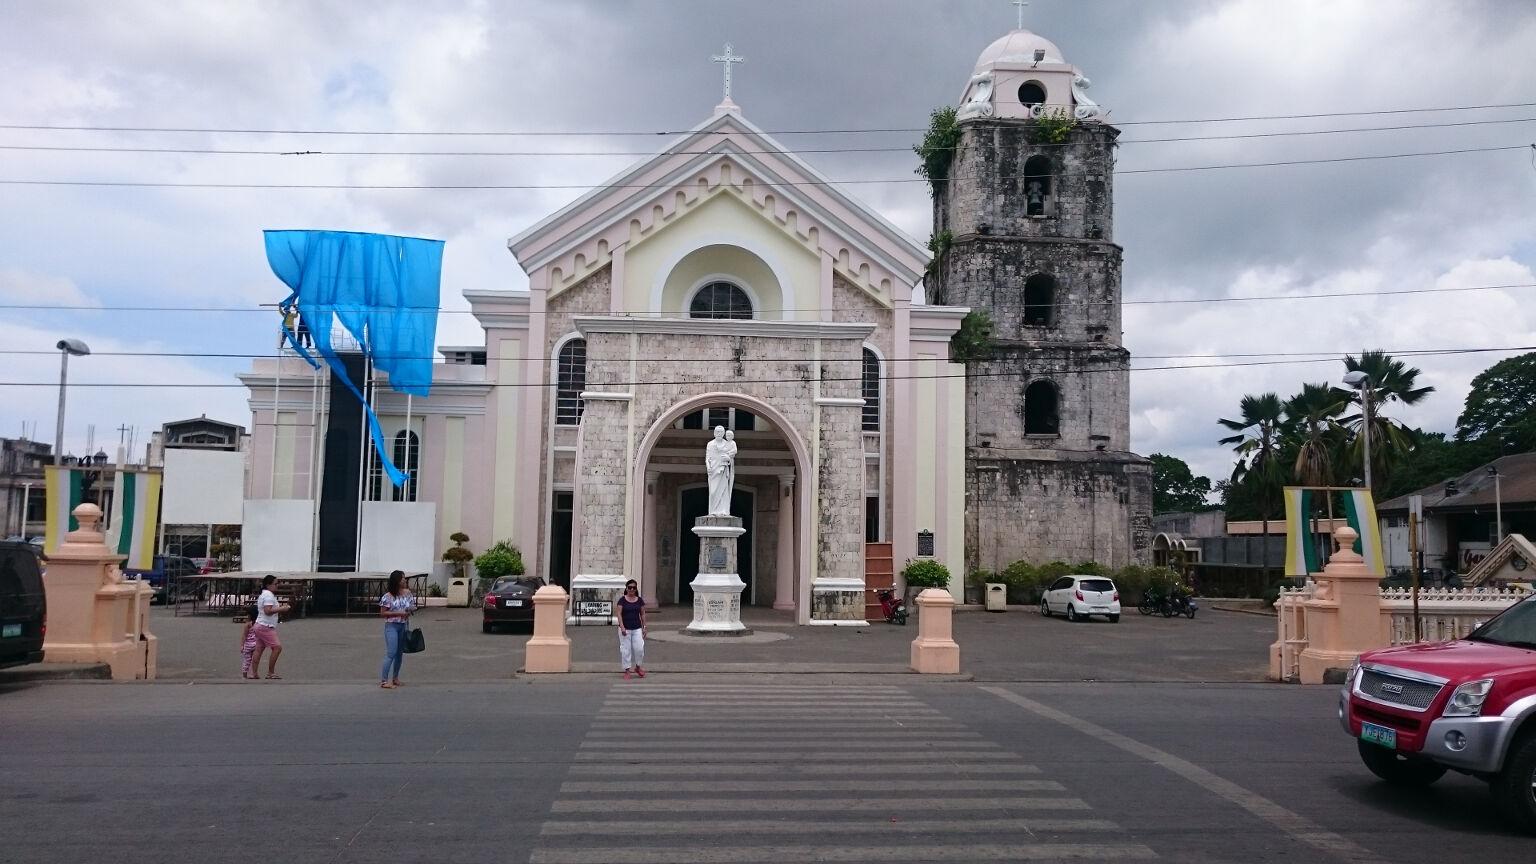 Tagbilaran plaza The Cathedral of Saint Joseph the Worker